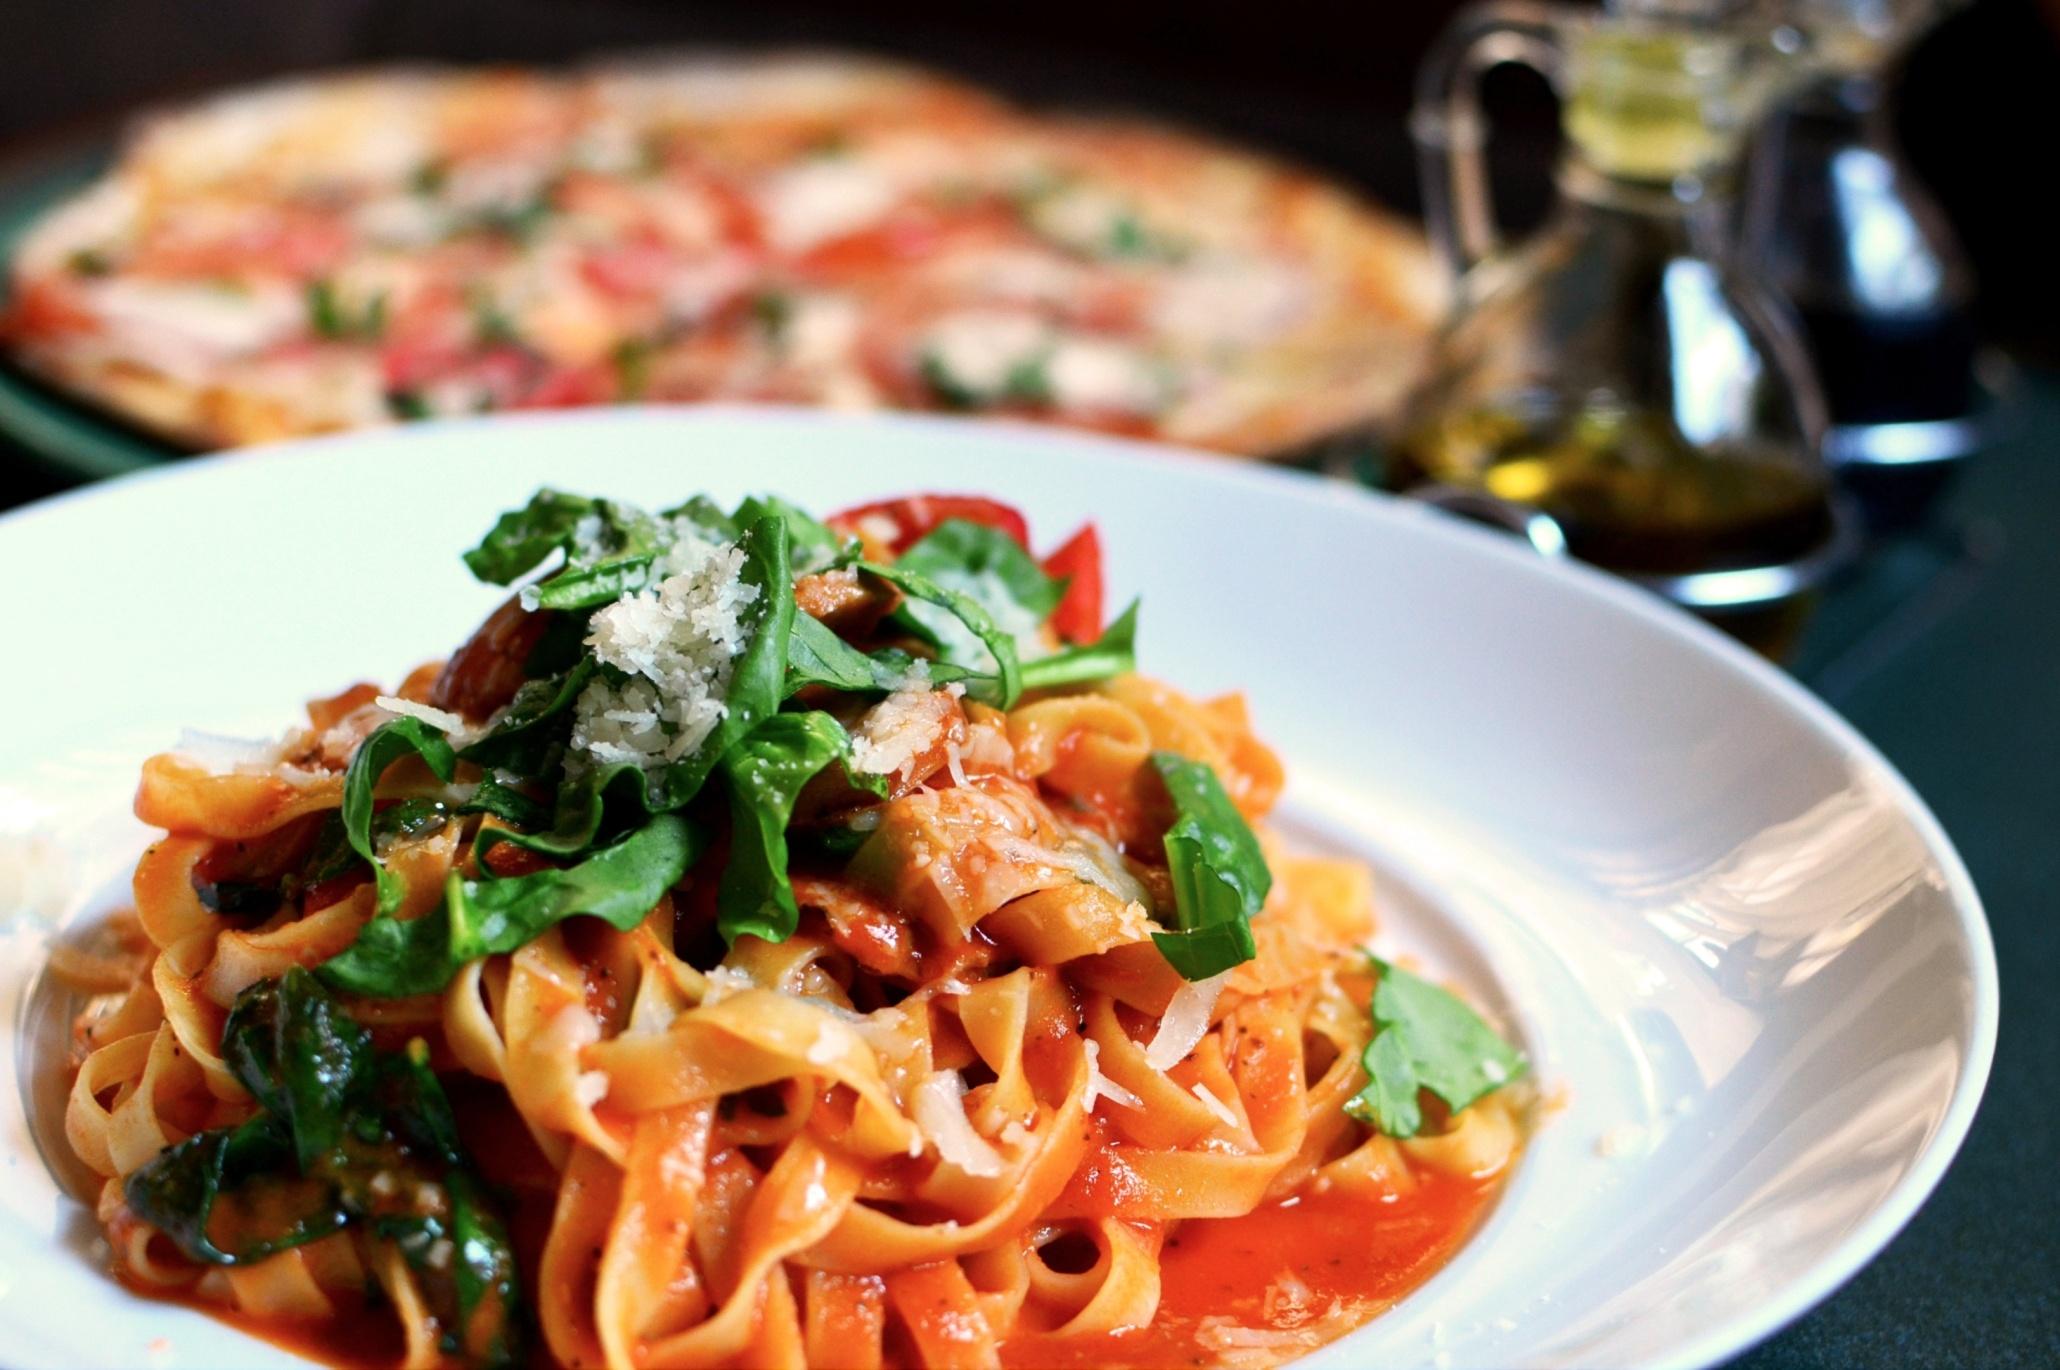 Italian Pasta and table setting